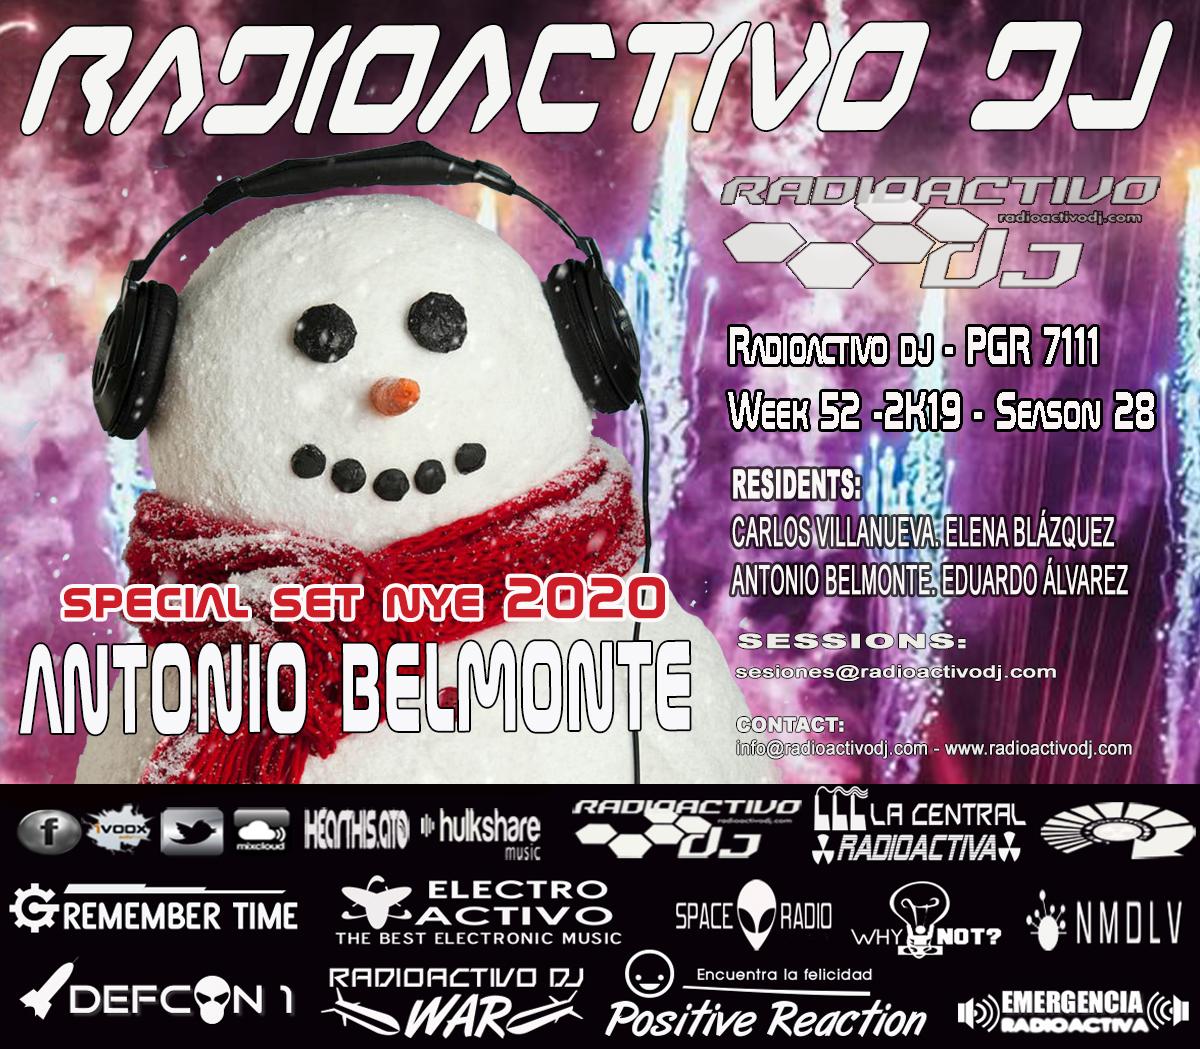 RADIOACTIVO-DJ-52-2019